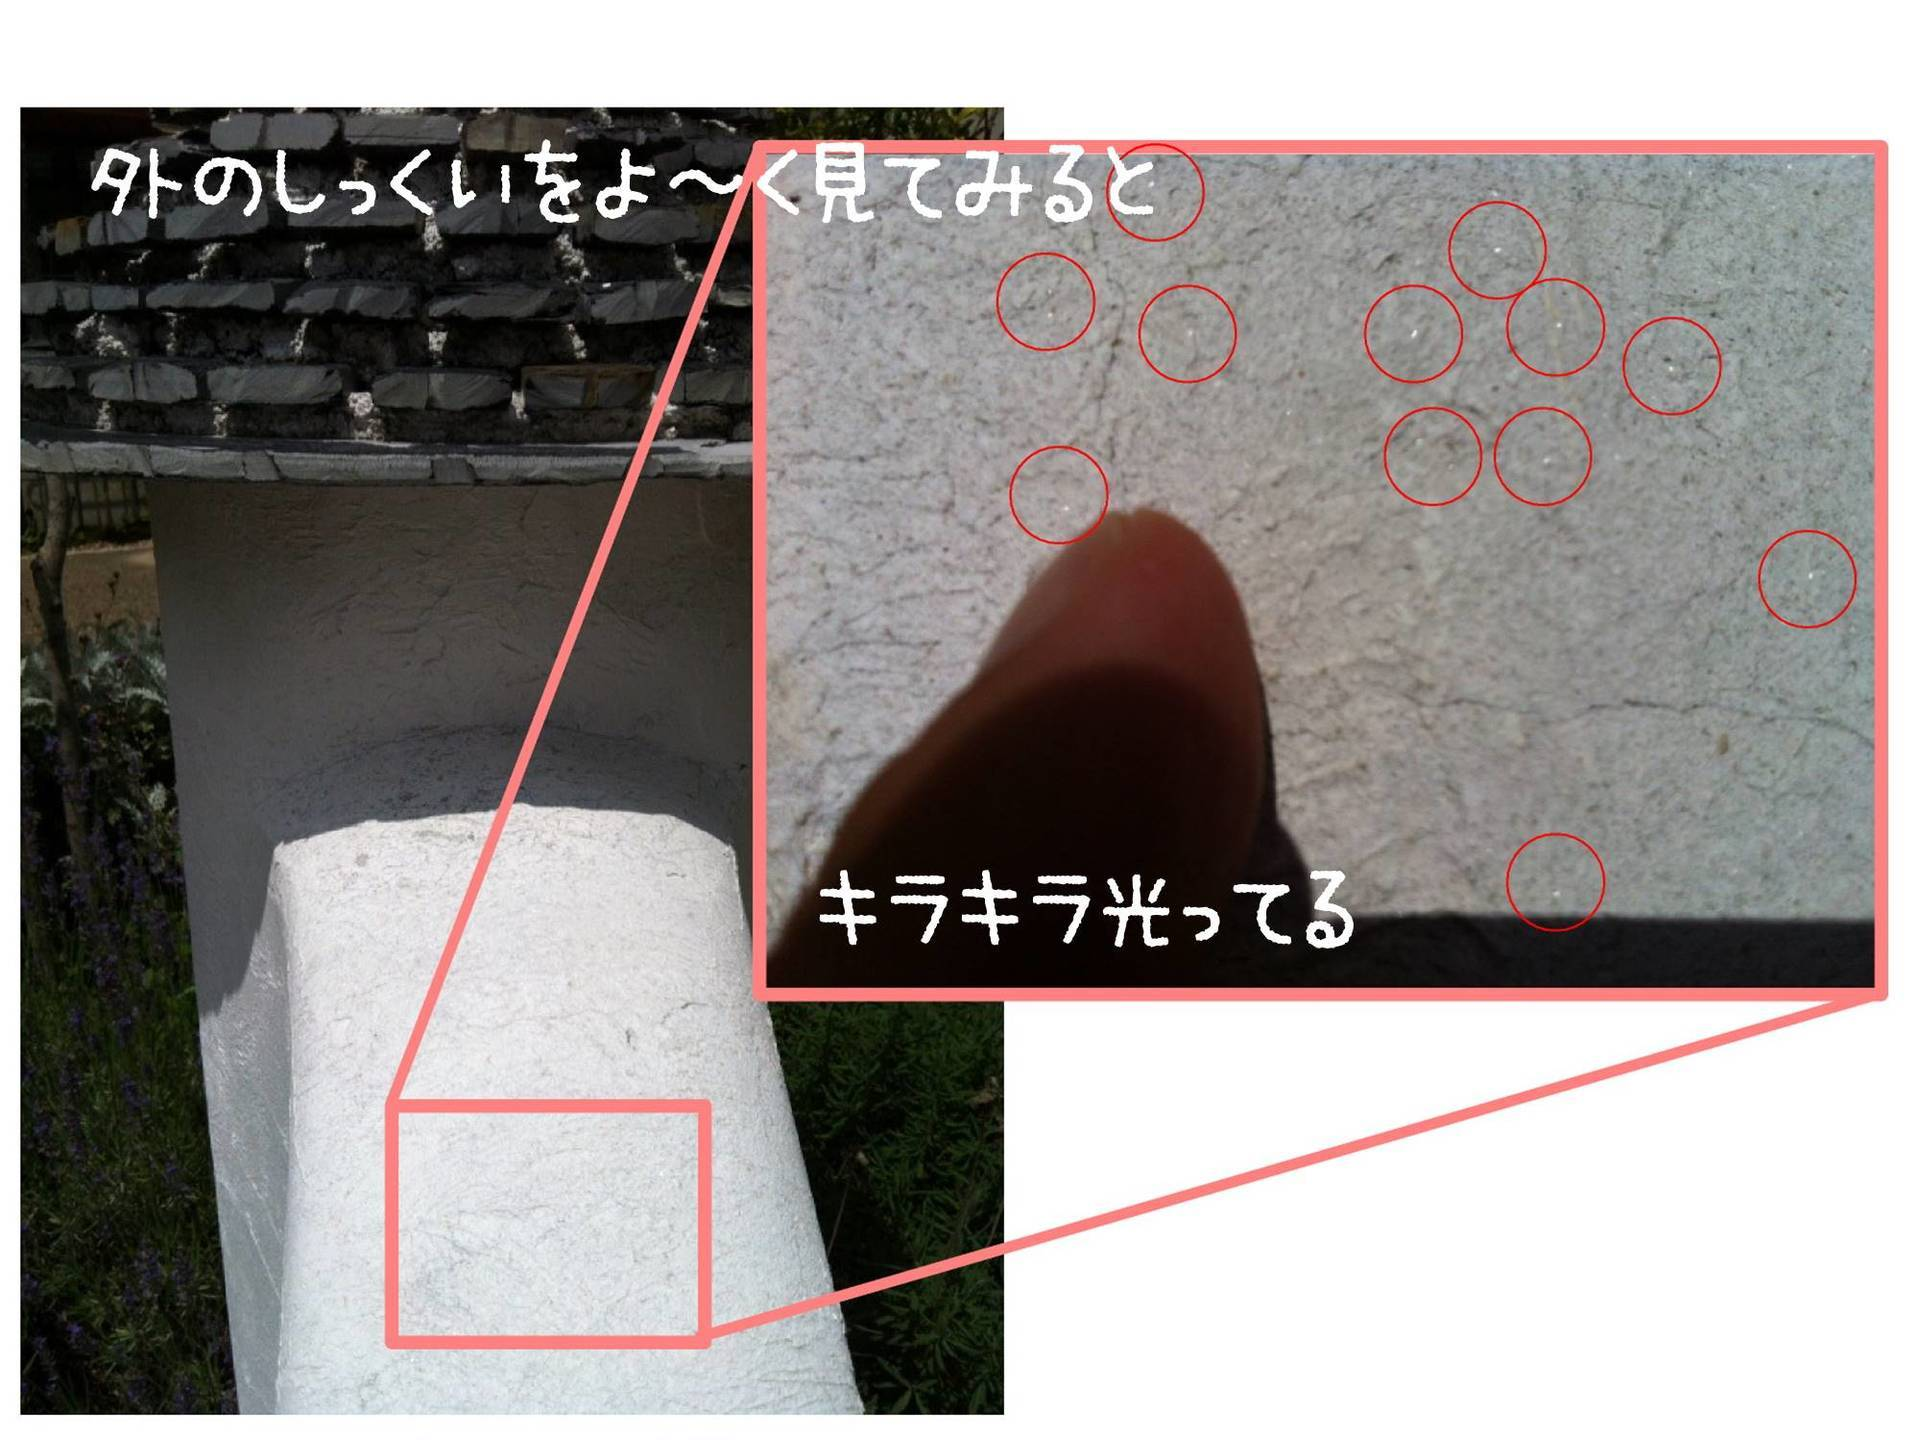 Sスライド42.JPG